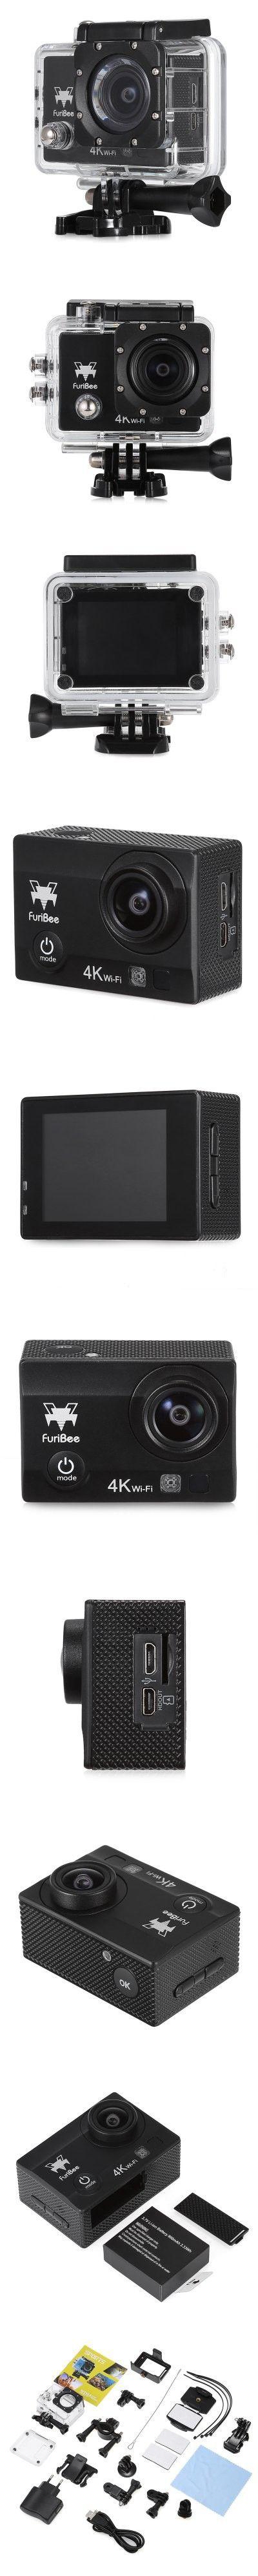 FuriBee Q6 WiFi 4K Ultra HD Action Sport Camera EU PLUG-38.13